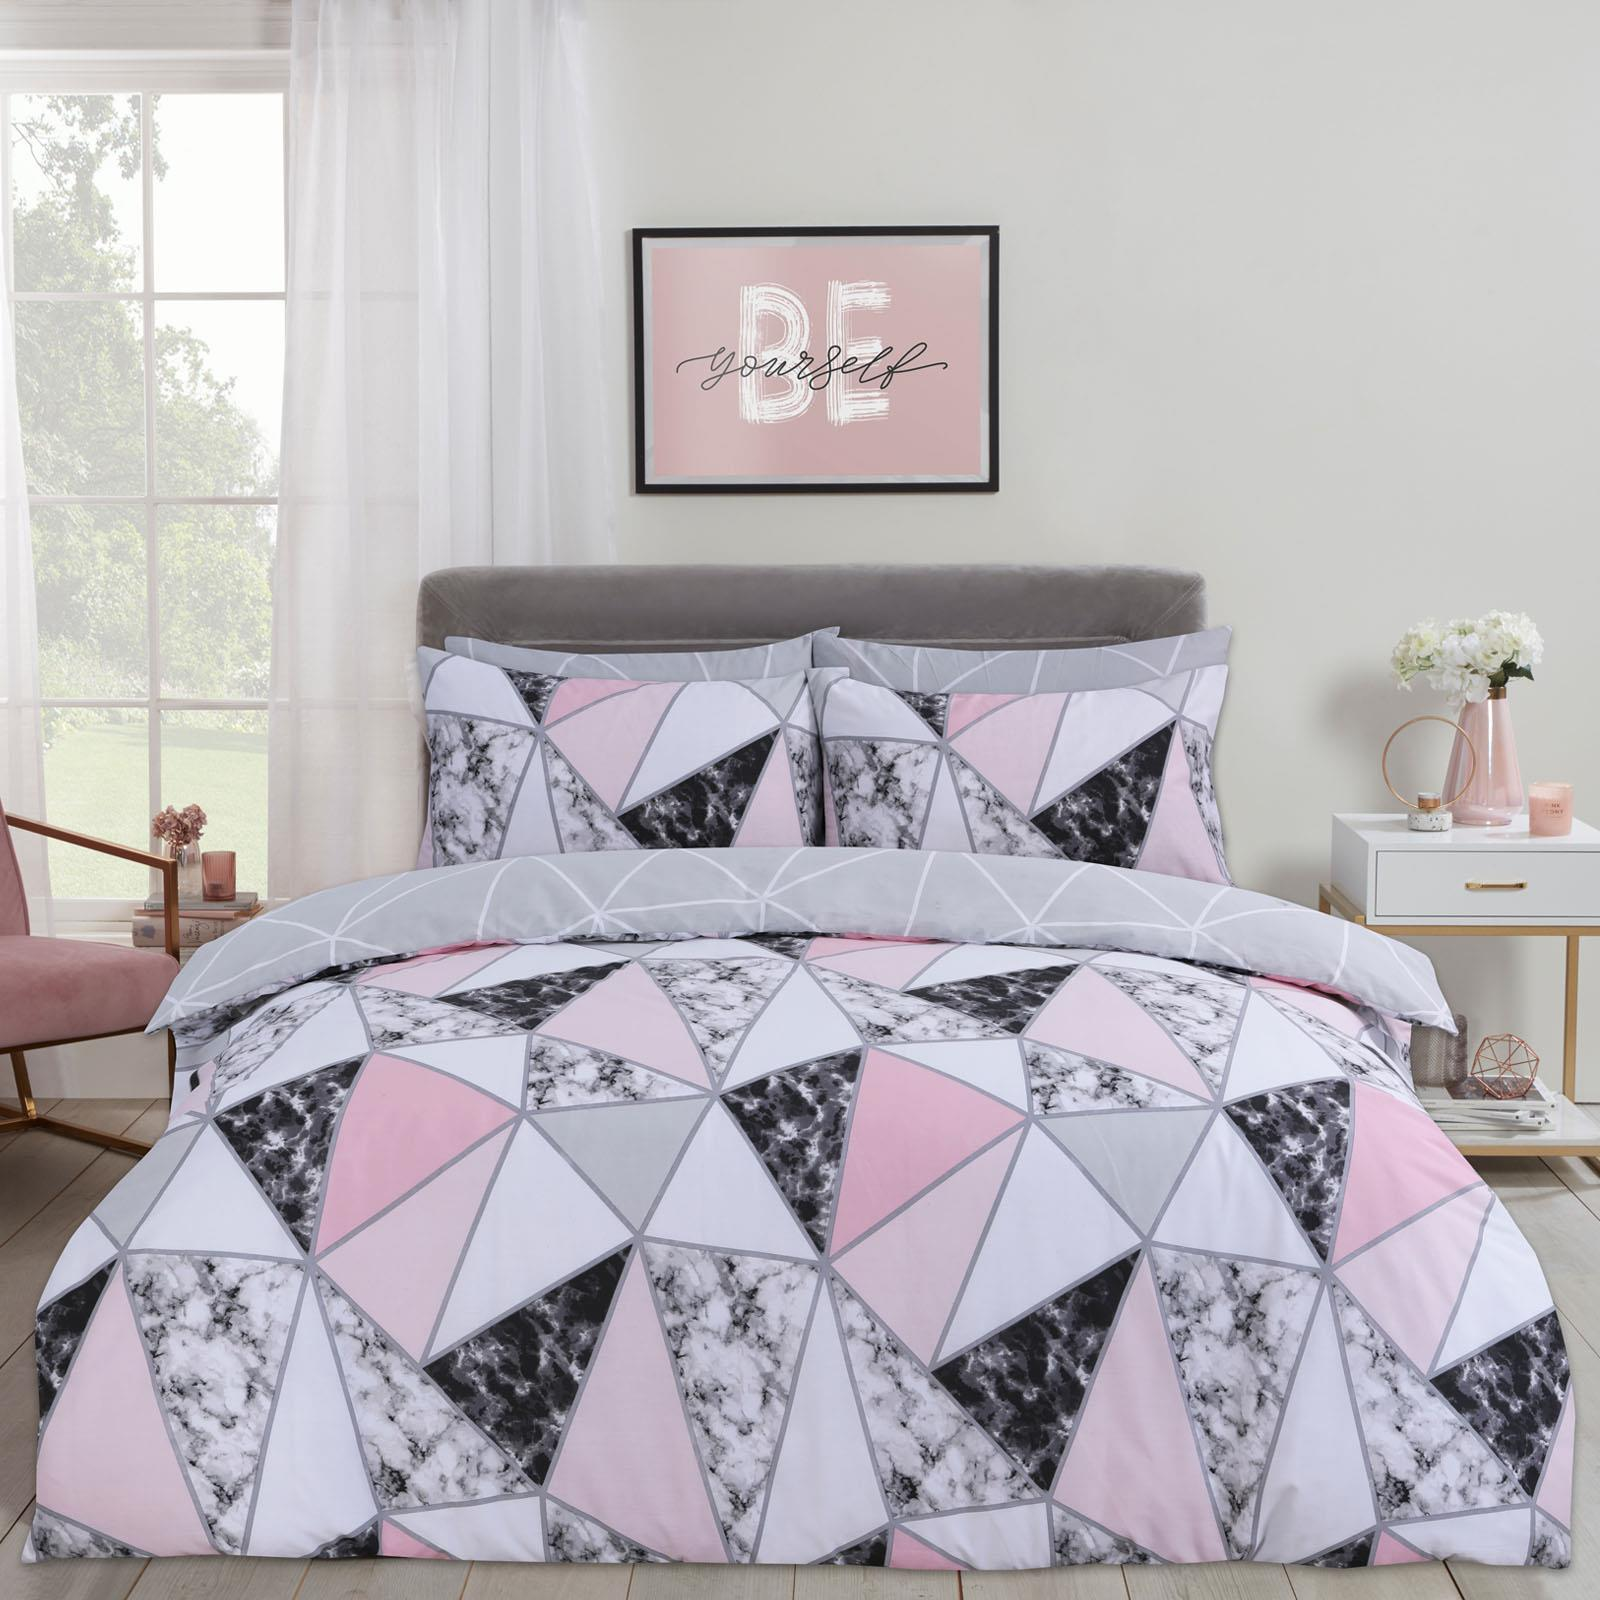 thumbnail 4 - Dreamscene Marble Geometric Duvet Cover with Pillowcase Bedding Set Grey Blush